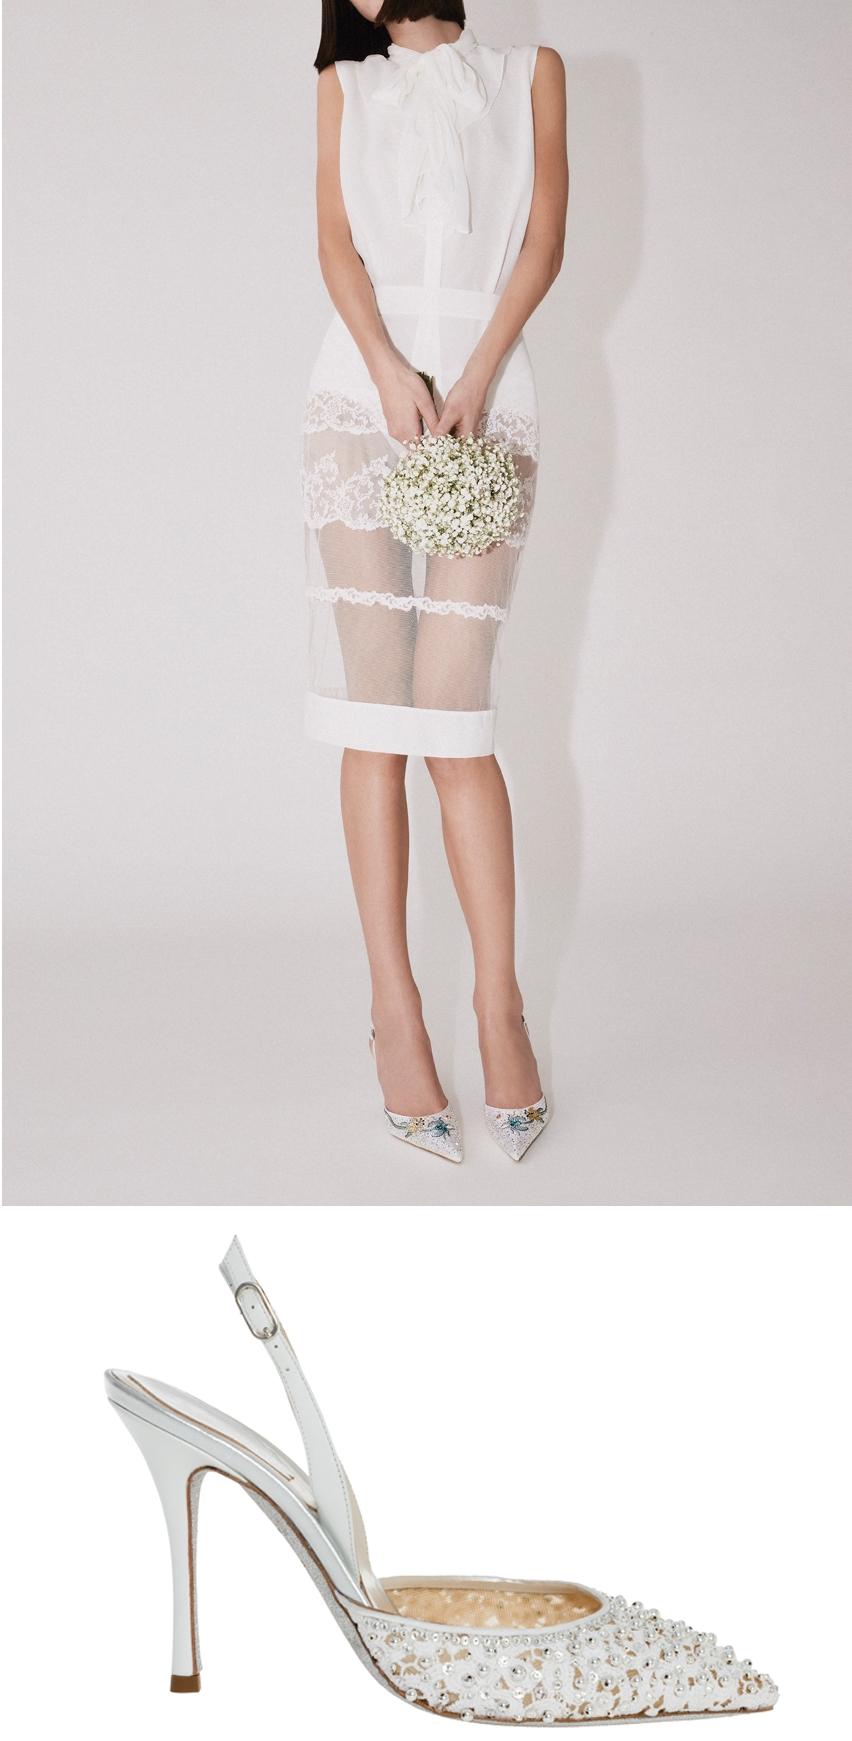 René Caovilla launches the 2020 bridal shoe collection